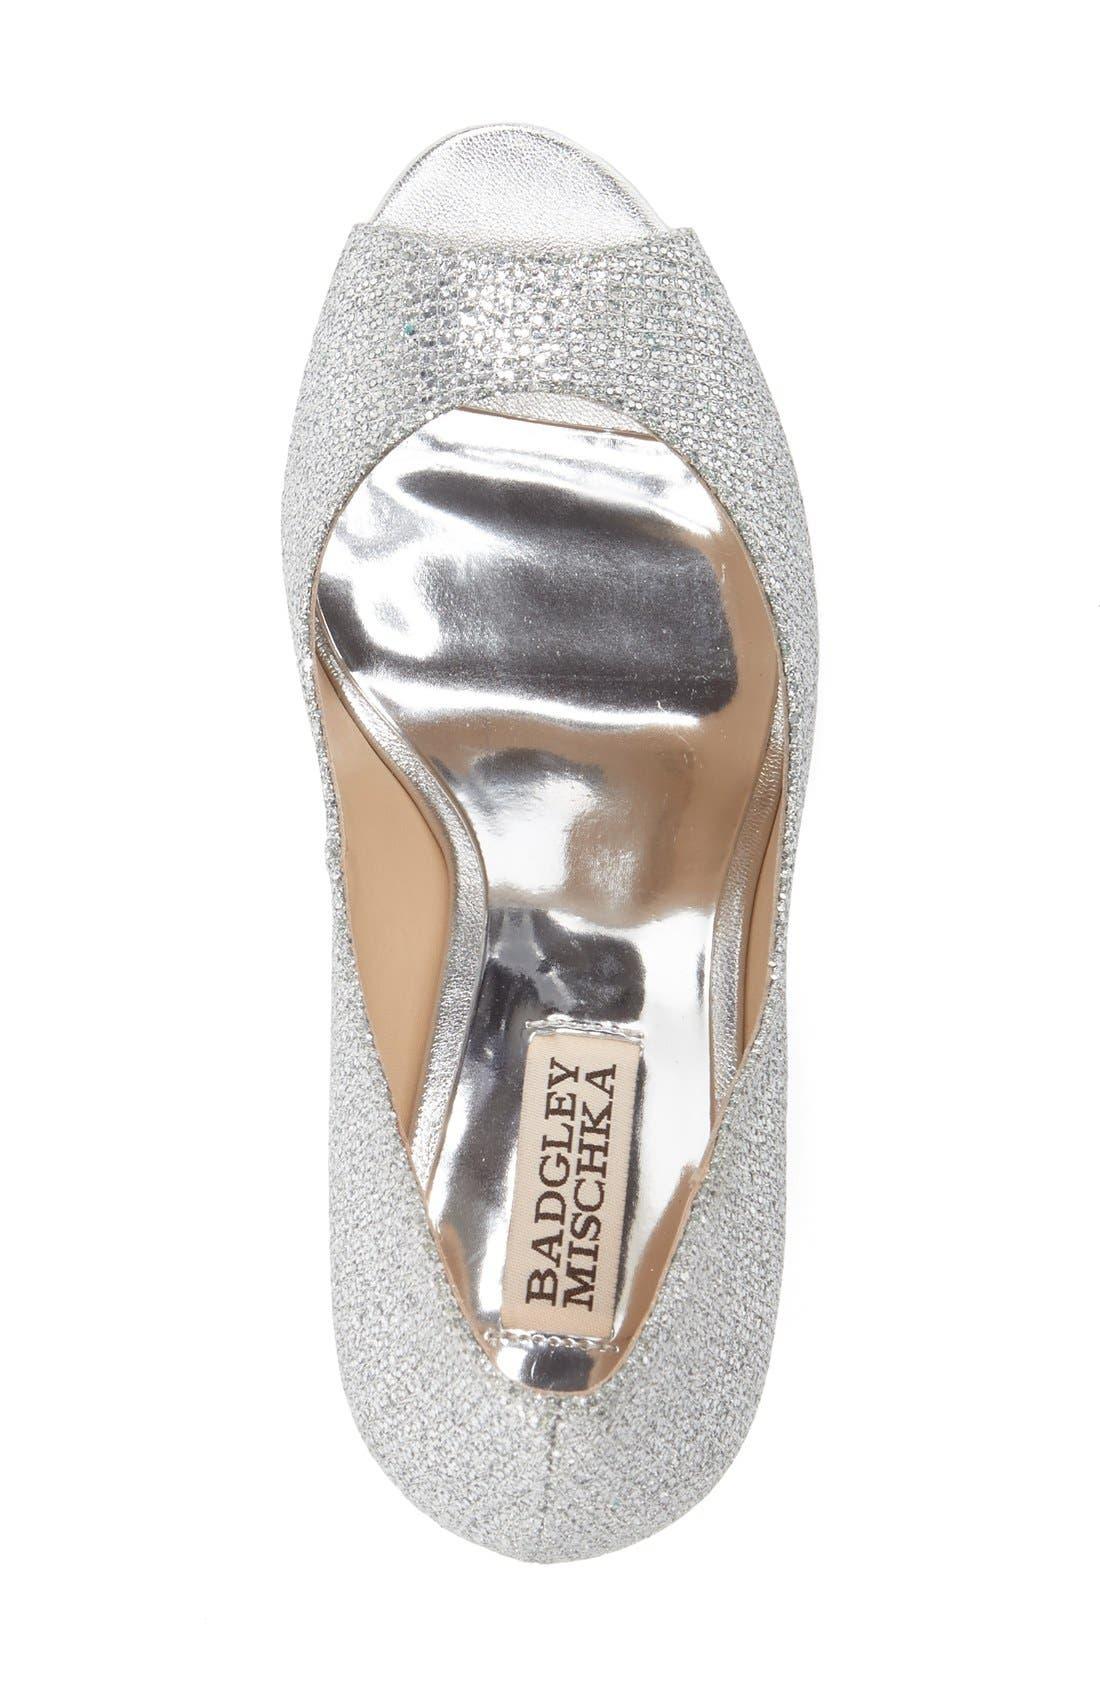 'Awake' Embellished Peep Toe Wedge Pump,                             Alternate thumbnail 3, color,                             Silver Glitter Fabric